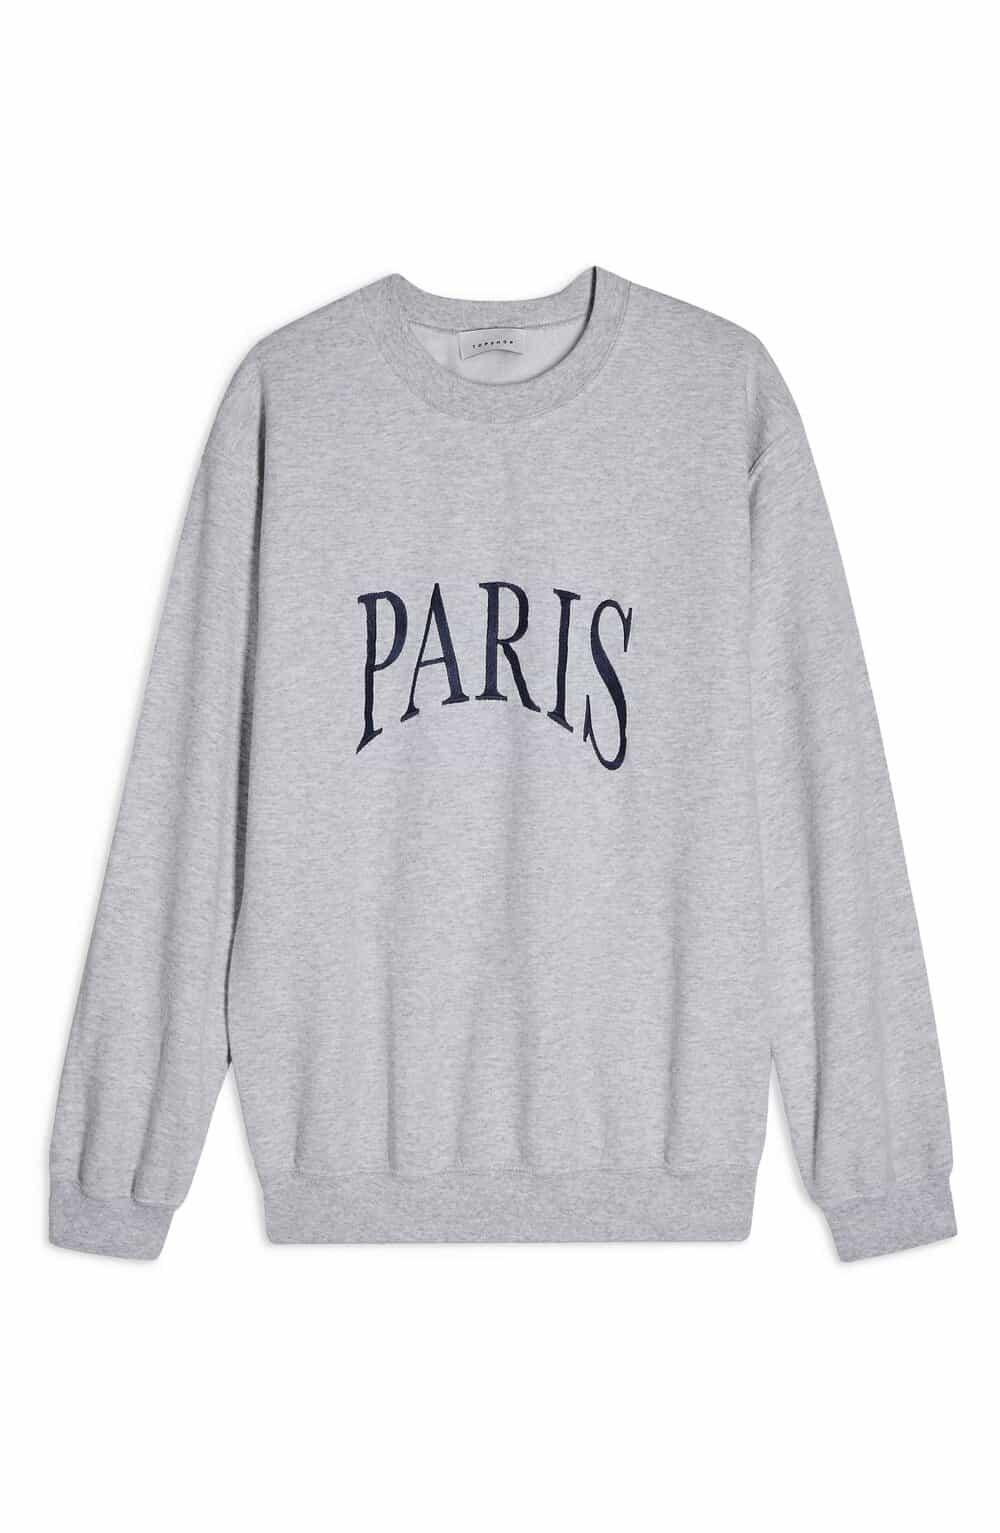 paris sweatshirt 25 Francophile Gifts Under $50